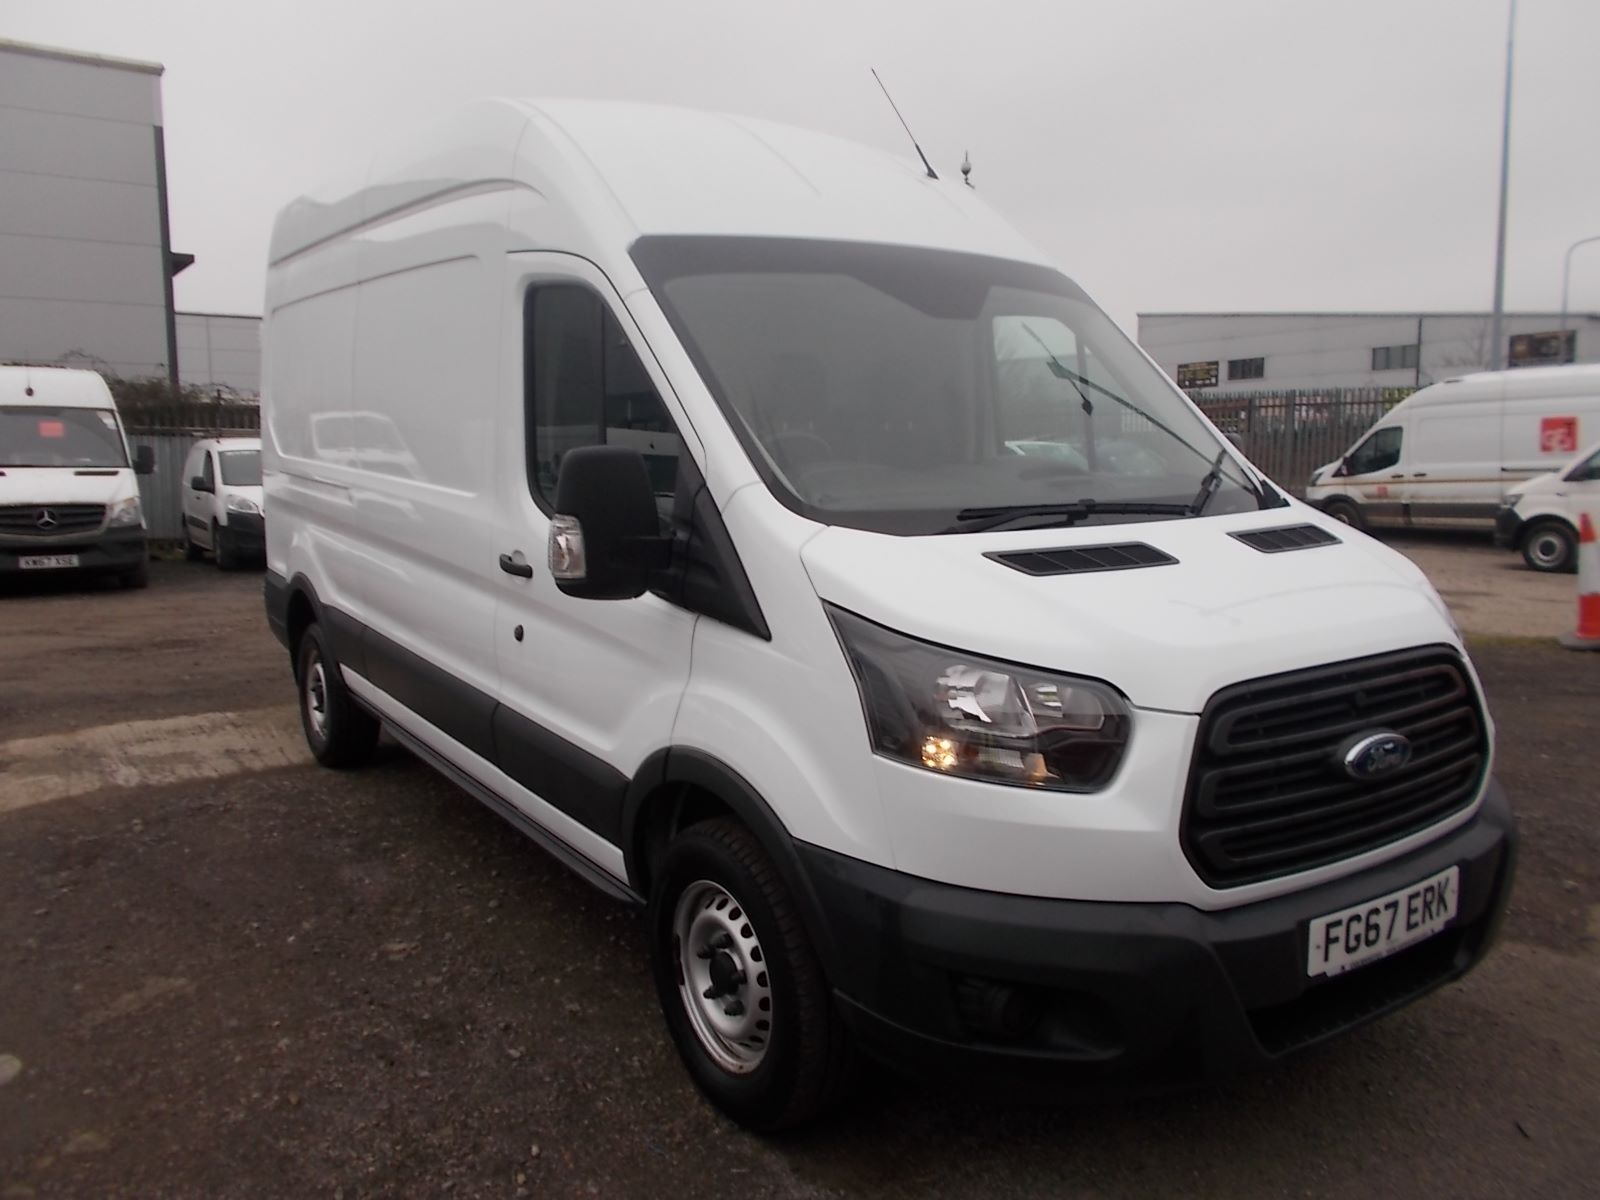 2017 Ford Transit L3 H3 VAN 130PS EURO 6 (FG67ERK)